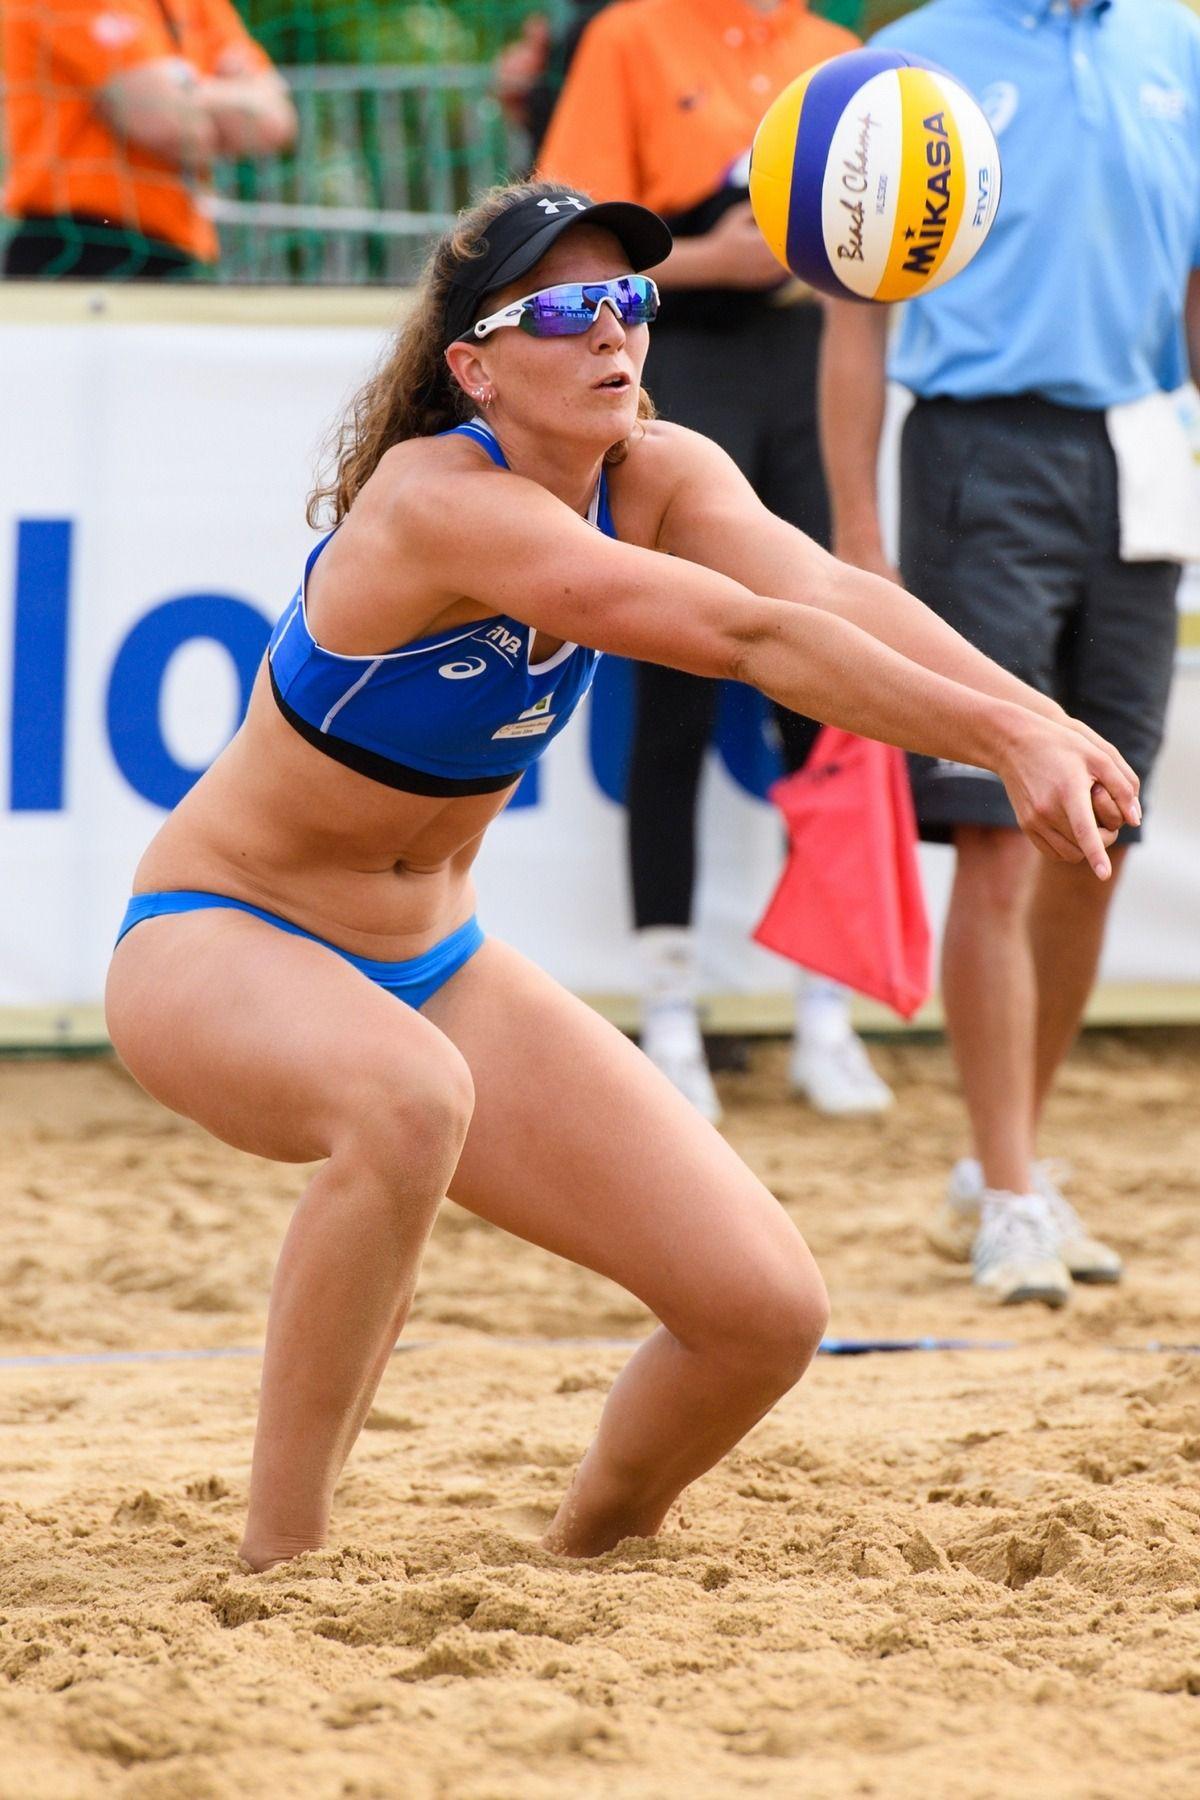 Jolien Sinnema Olsztyn Grand Slam 2016 Women Volleyball Beach Volleyball Female Athletes